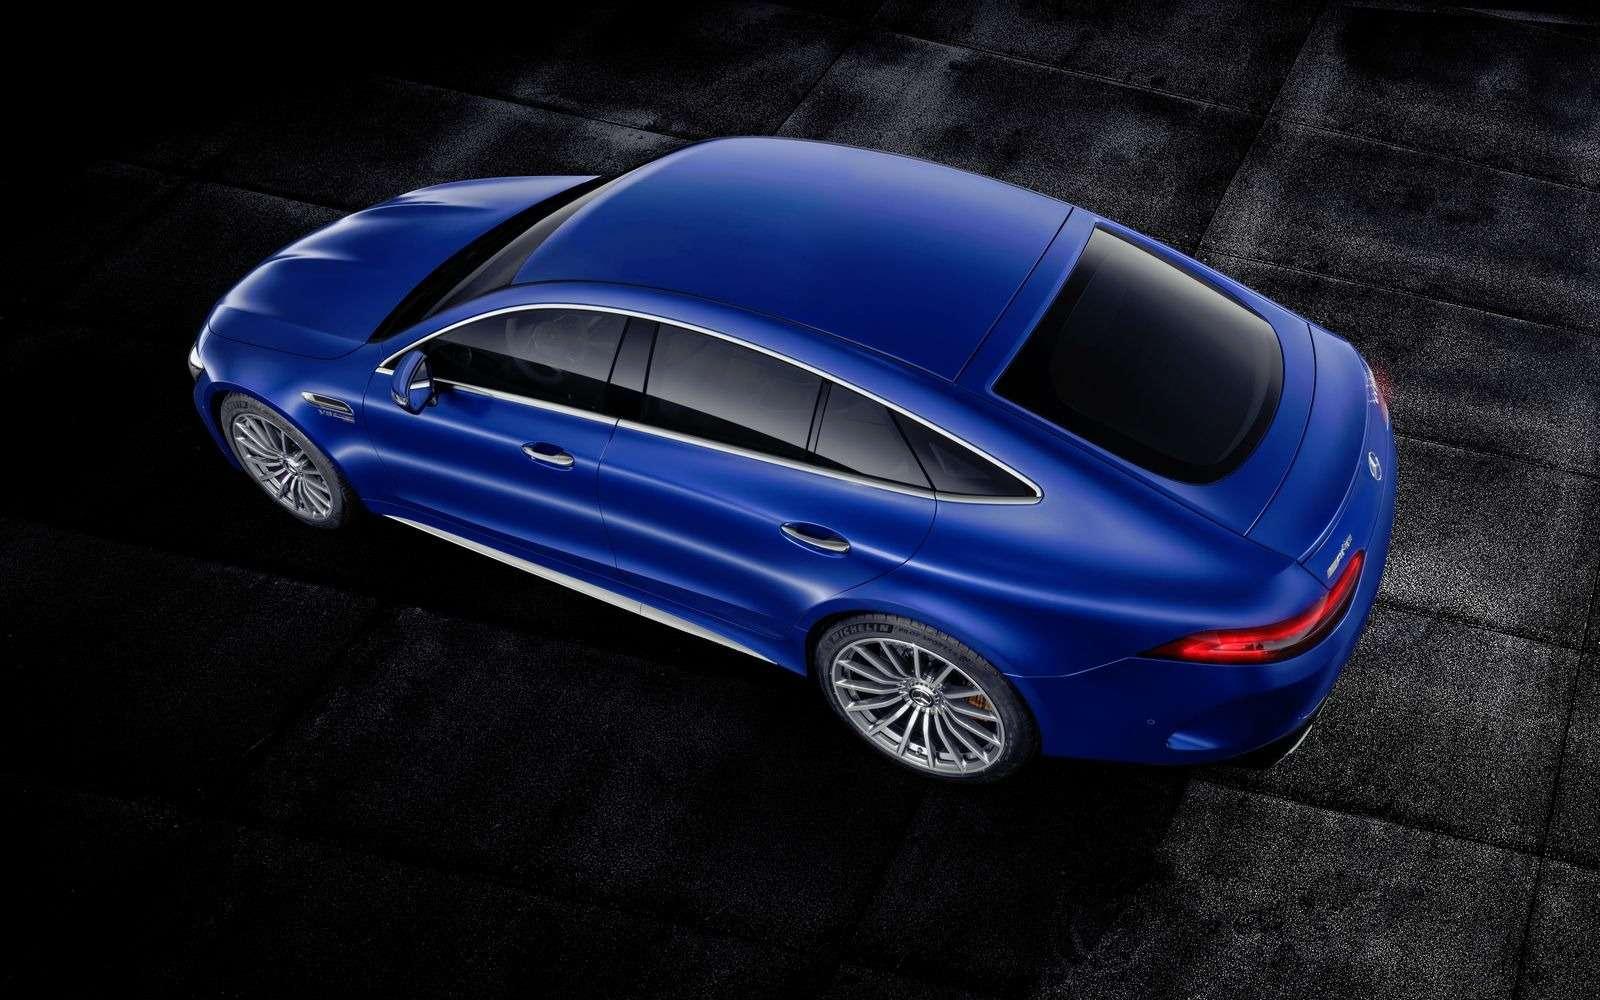 Подмена! Пятидверный Mercedes-AMG GTполучил «тележку» Е-класса— фото 851517